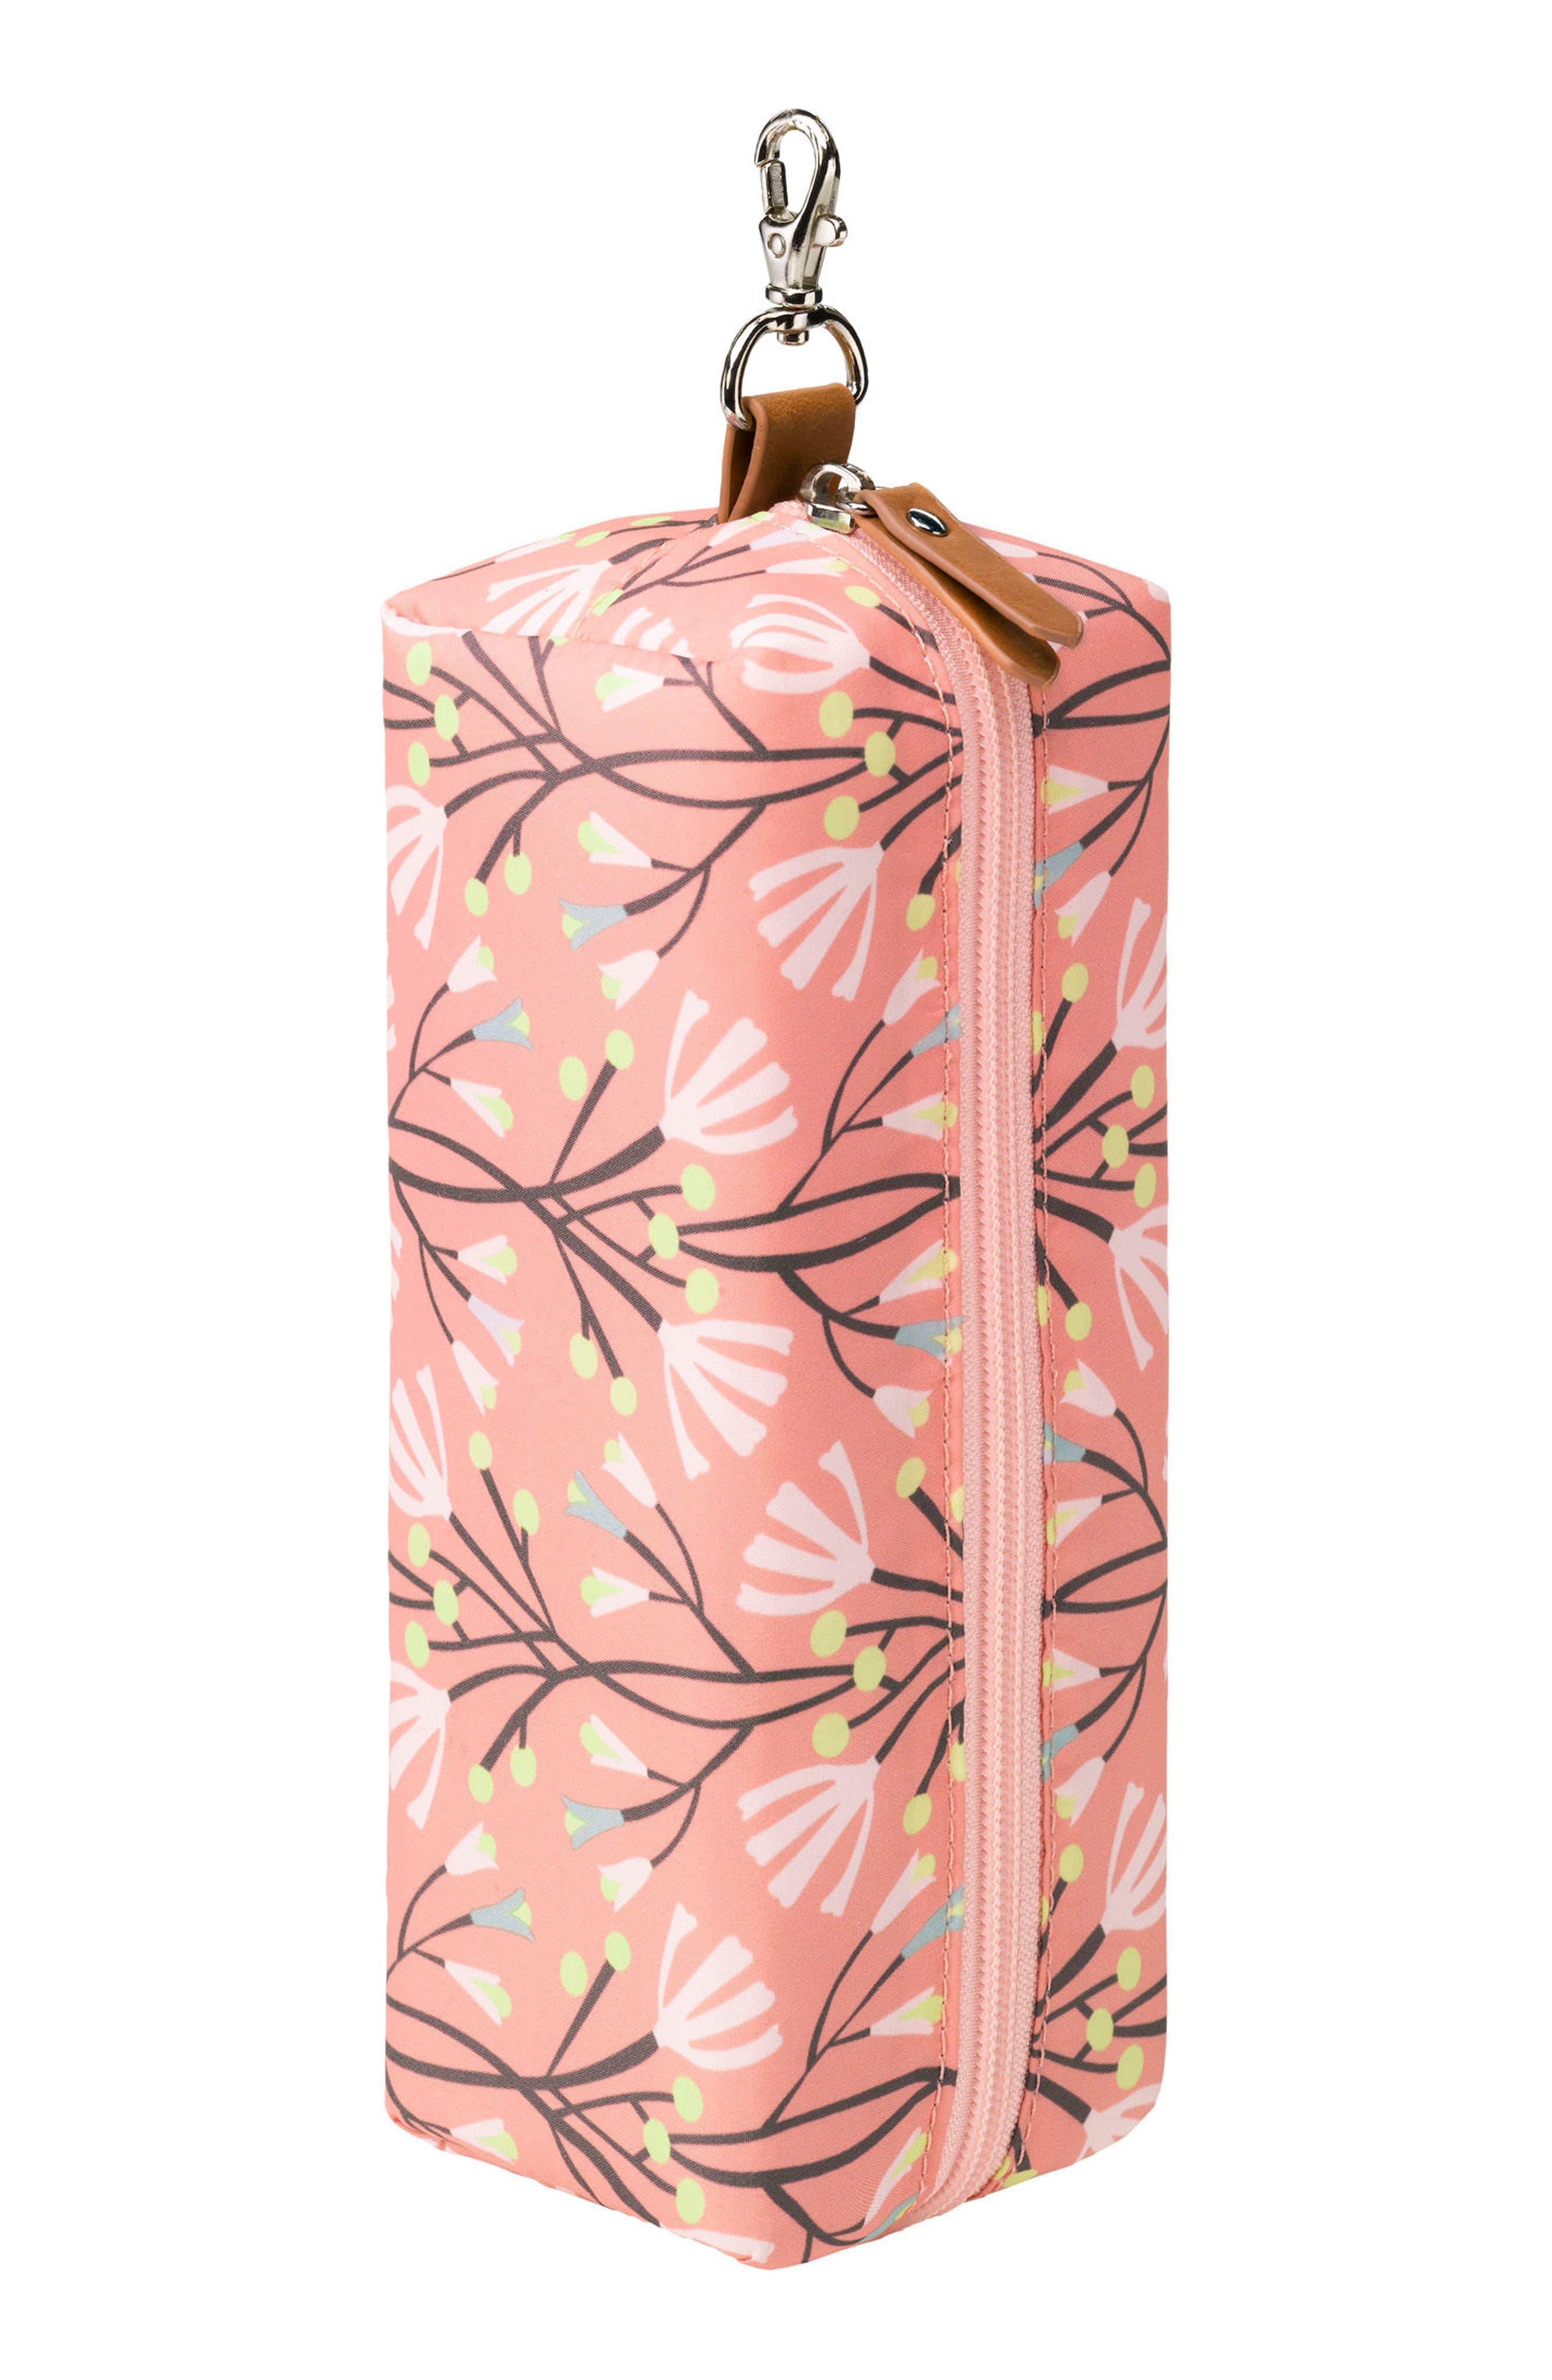 Alternate Image 1 Selected - Petunia Pickle Bottom 'Bottle Butler' Case